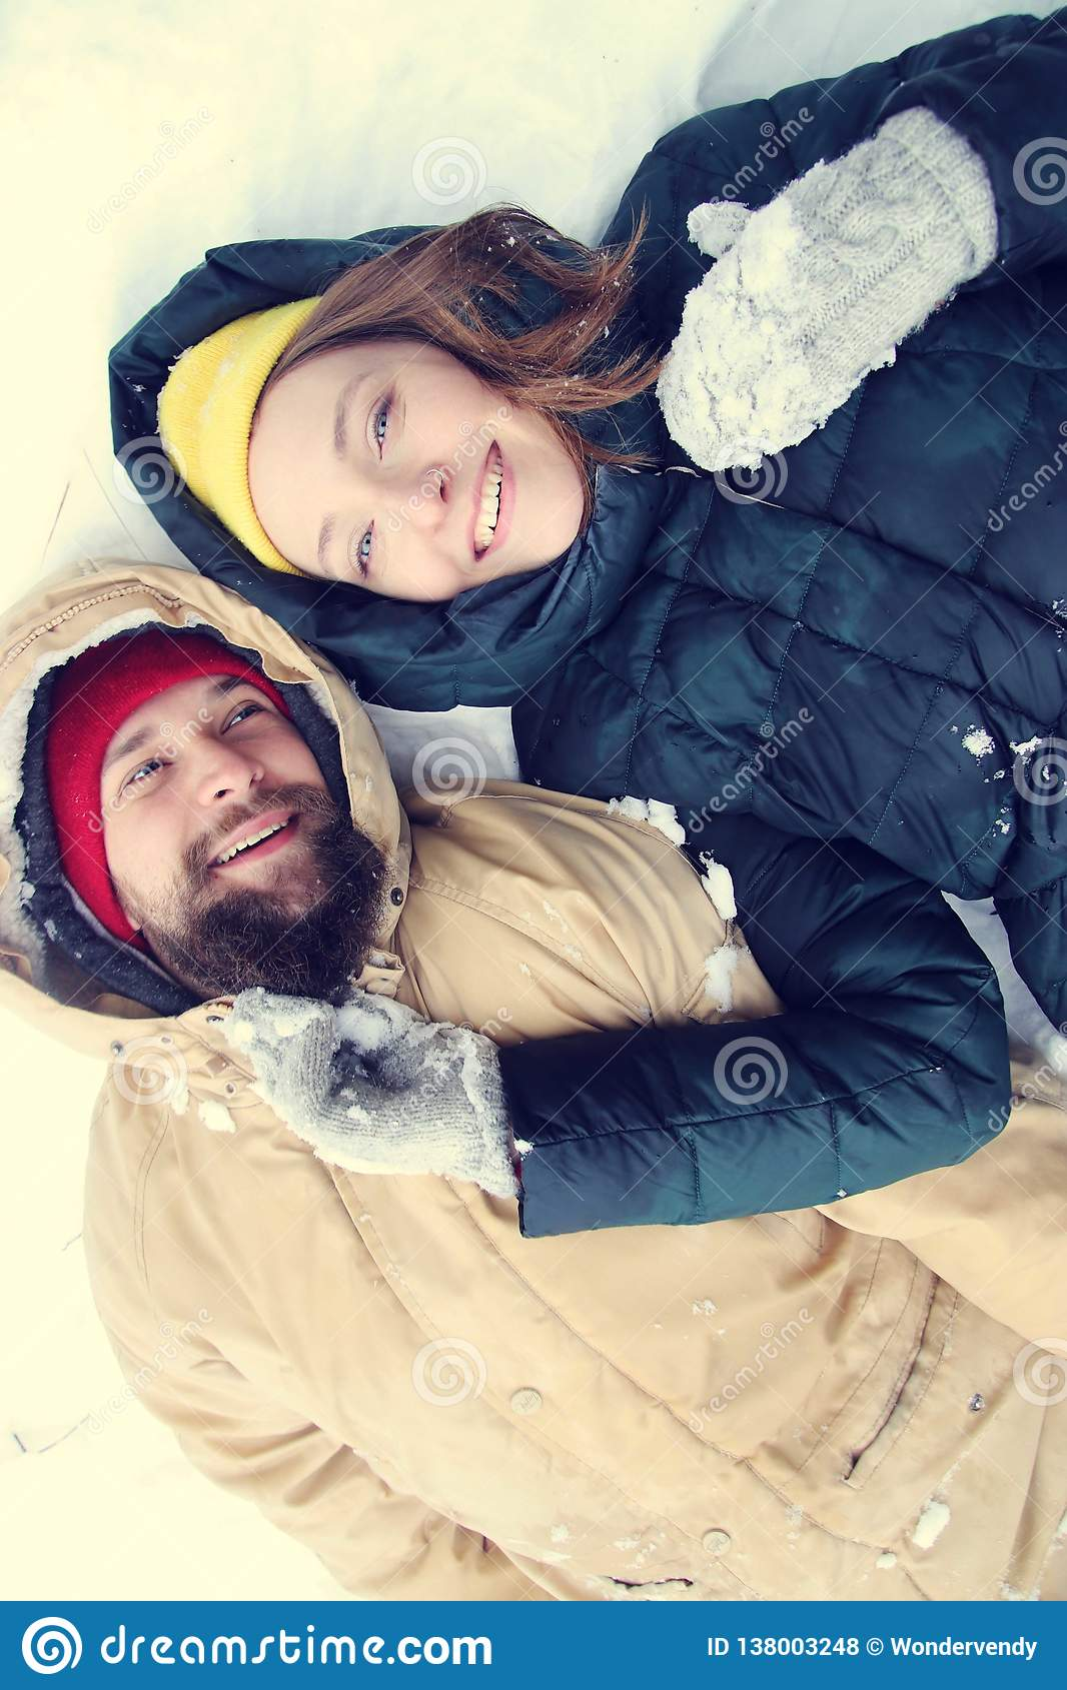 Happy couple in love having fun in the snow.